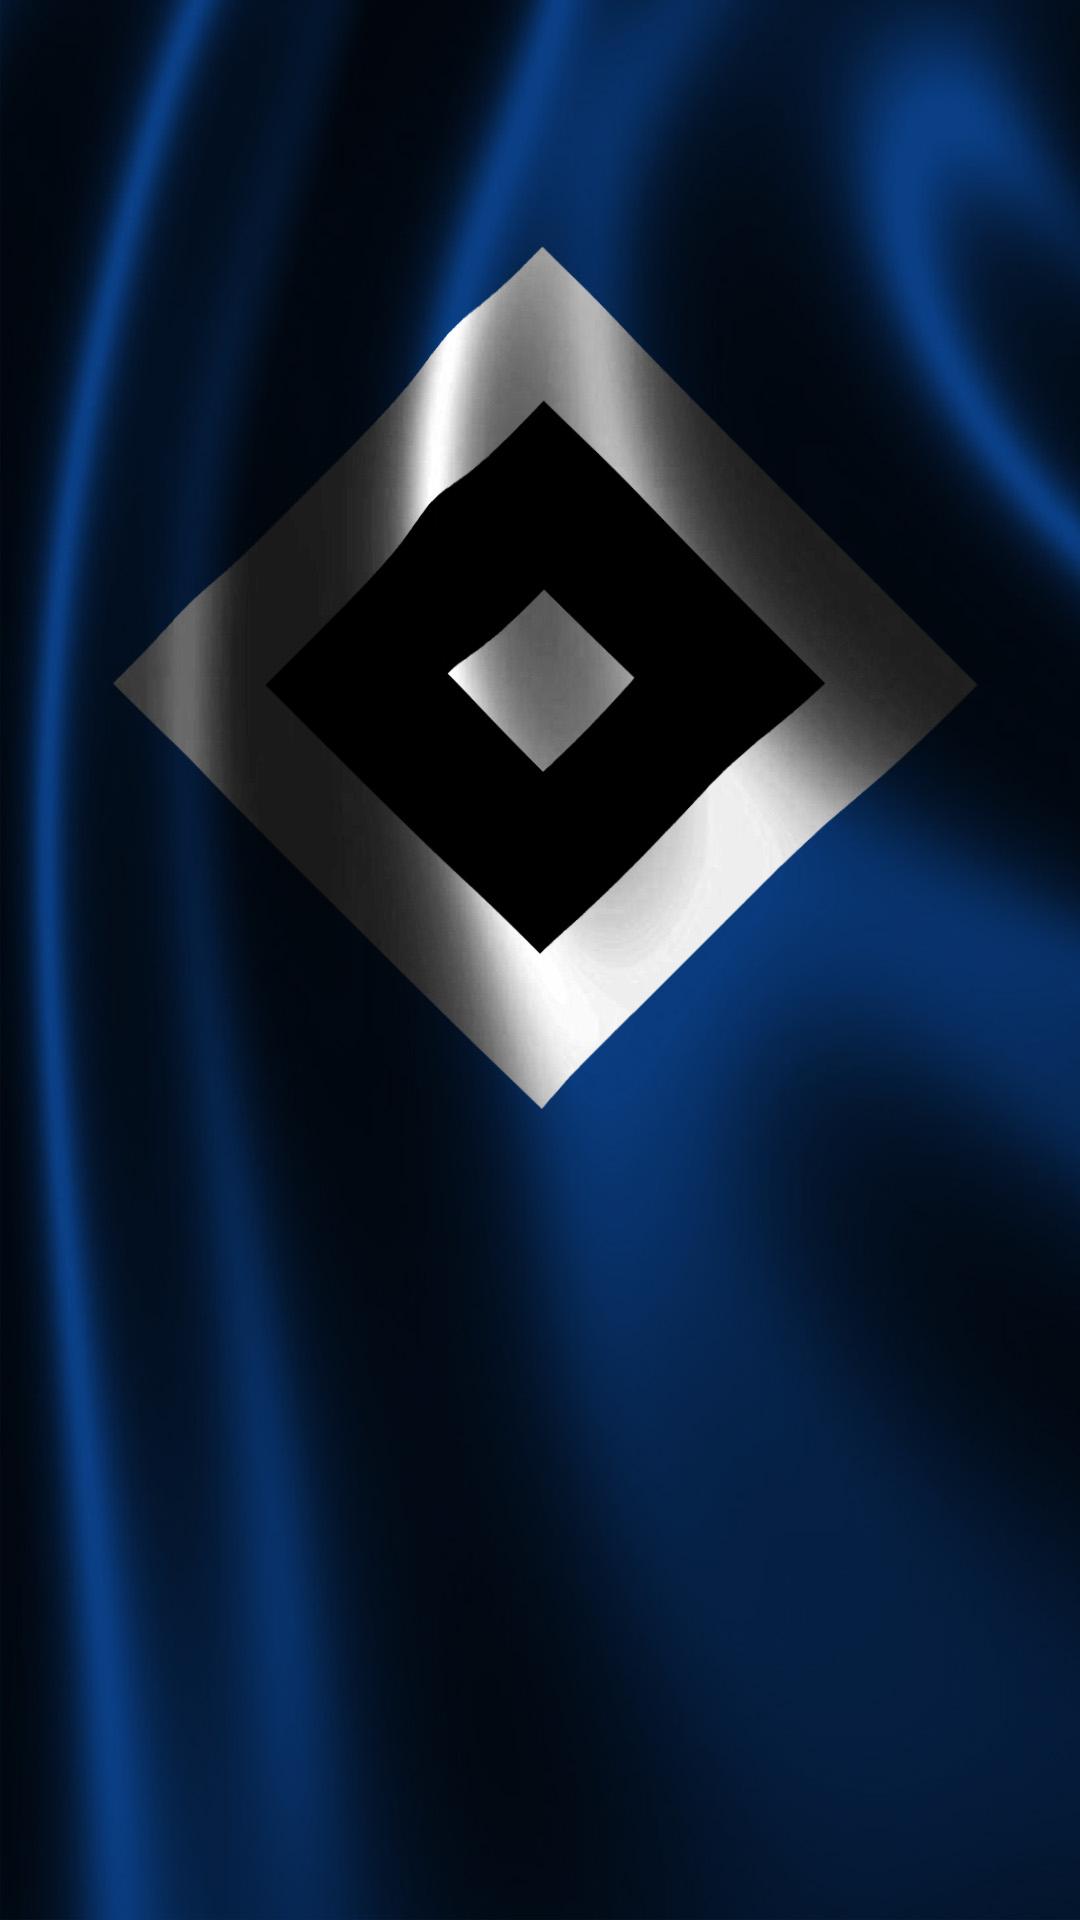 Hamburger Sv 007 Kostenloses Handy Hintergrundbild